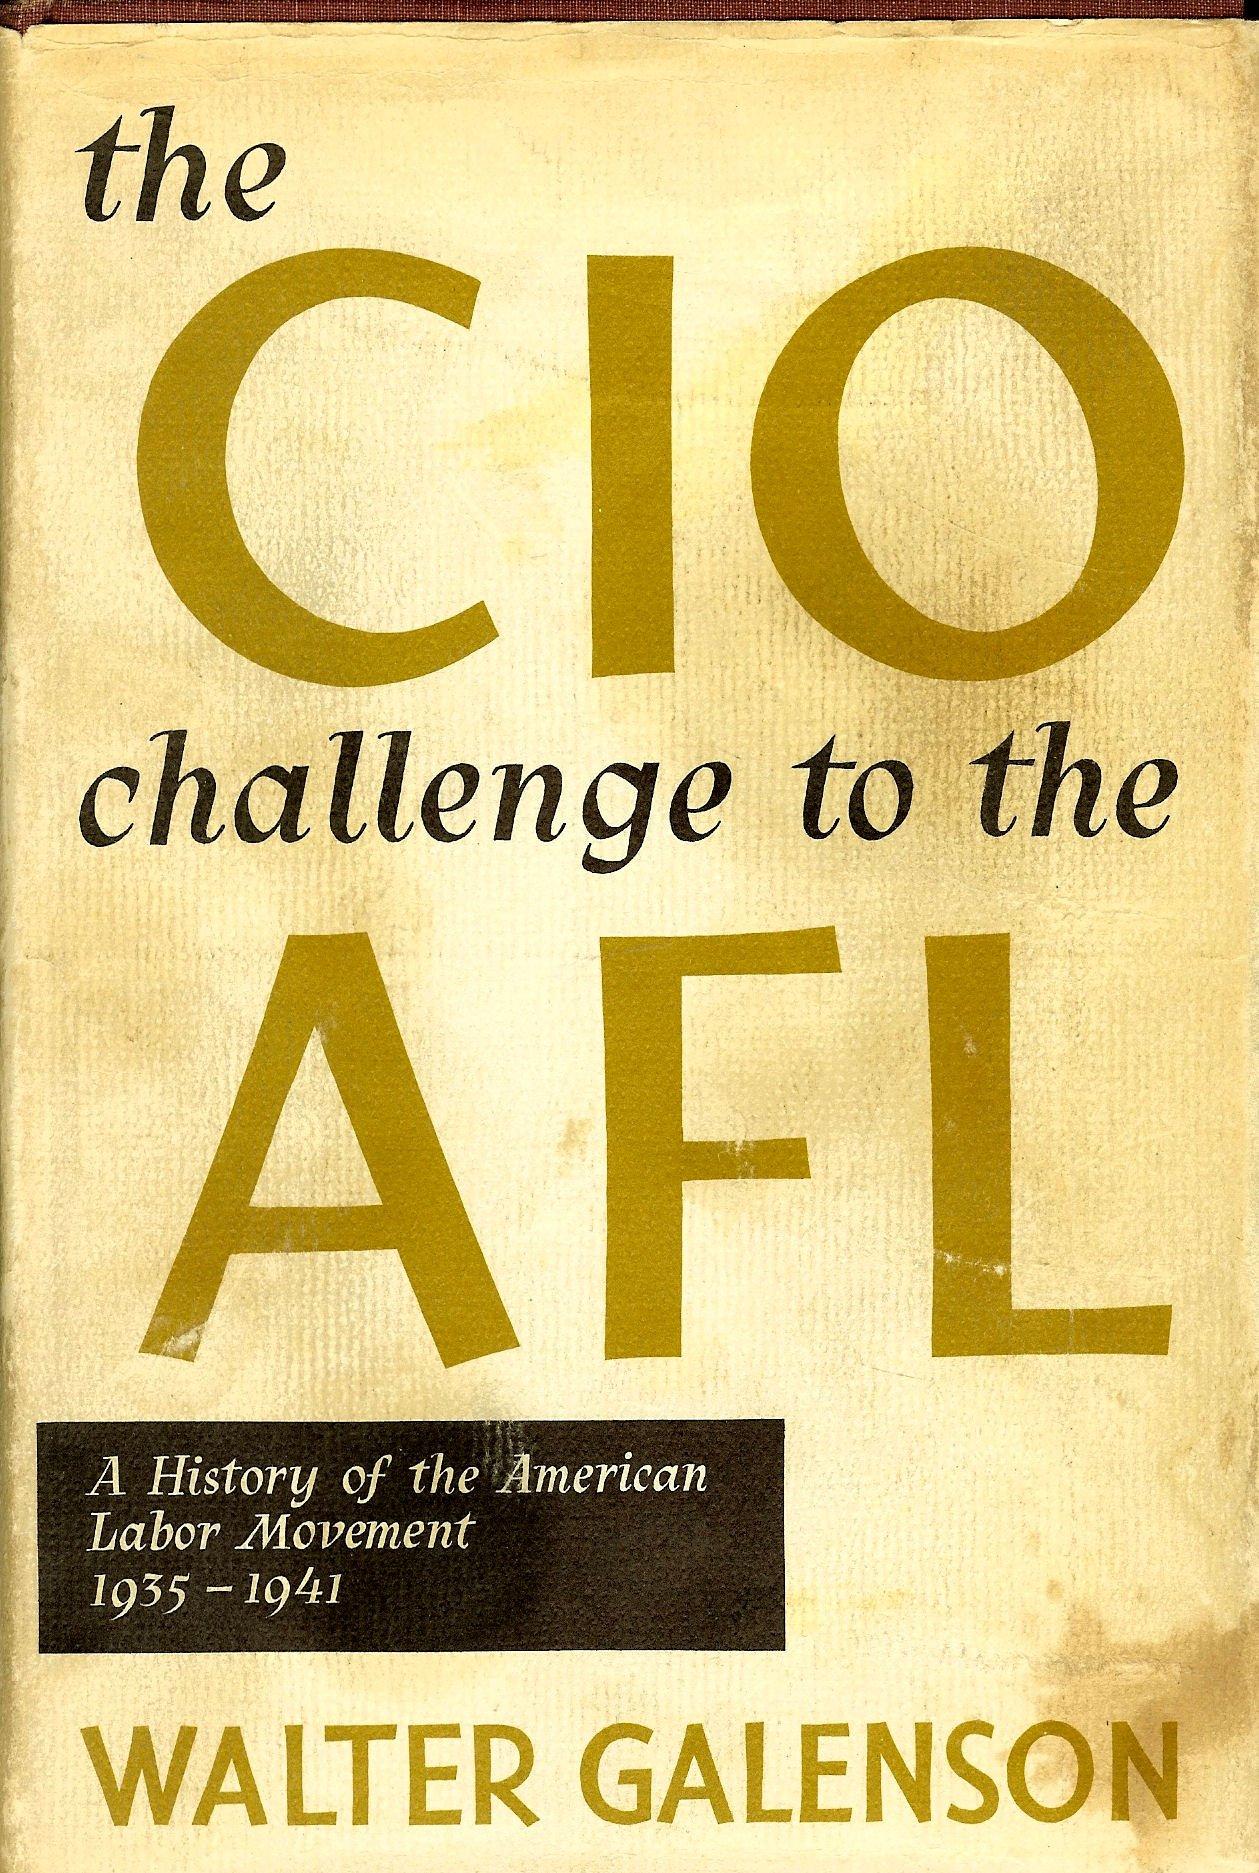 The CIO challenge to the AFL